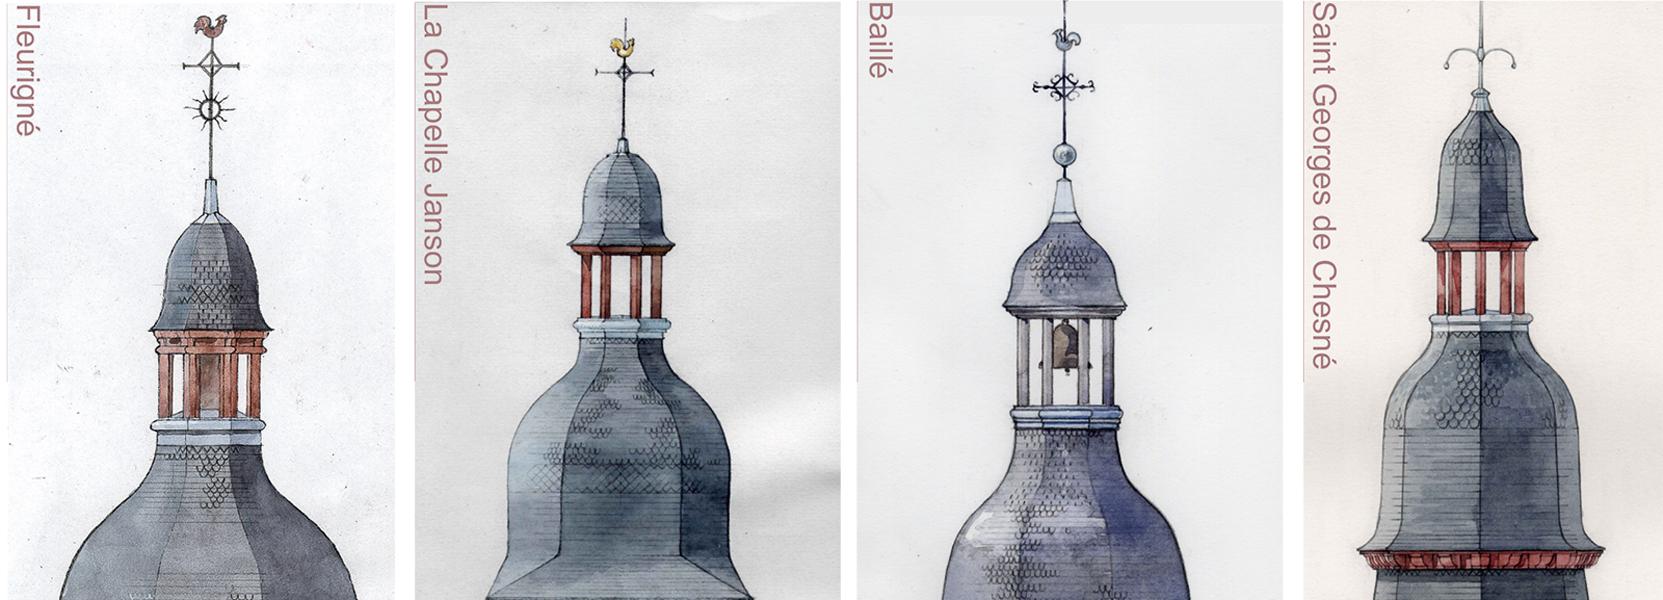 Clocher de Bretagne - Aquarelle Piotr Candio